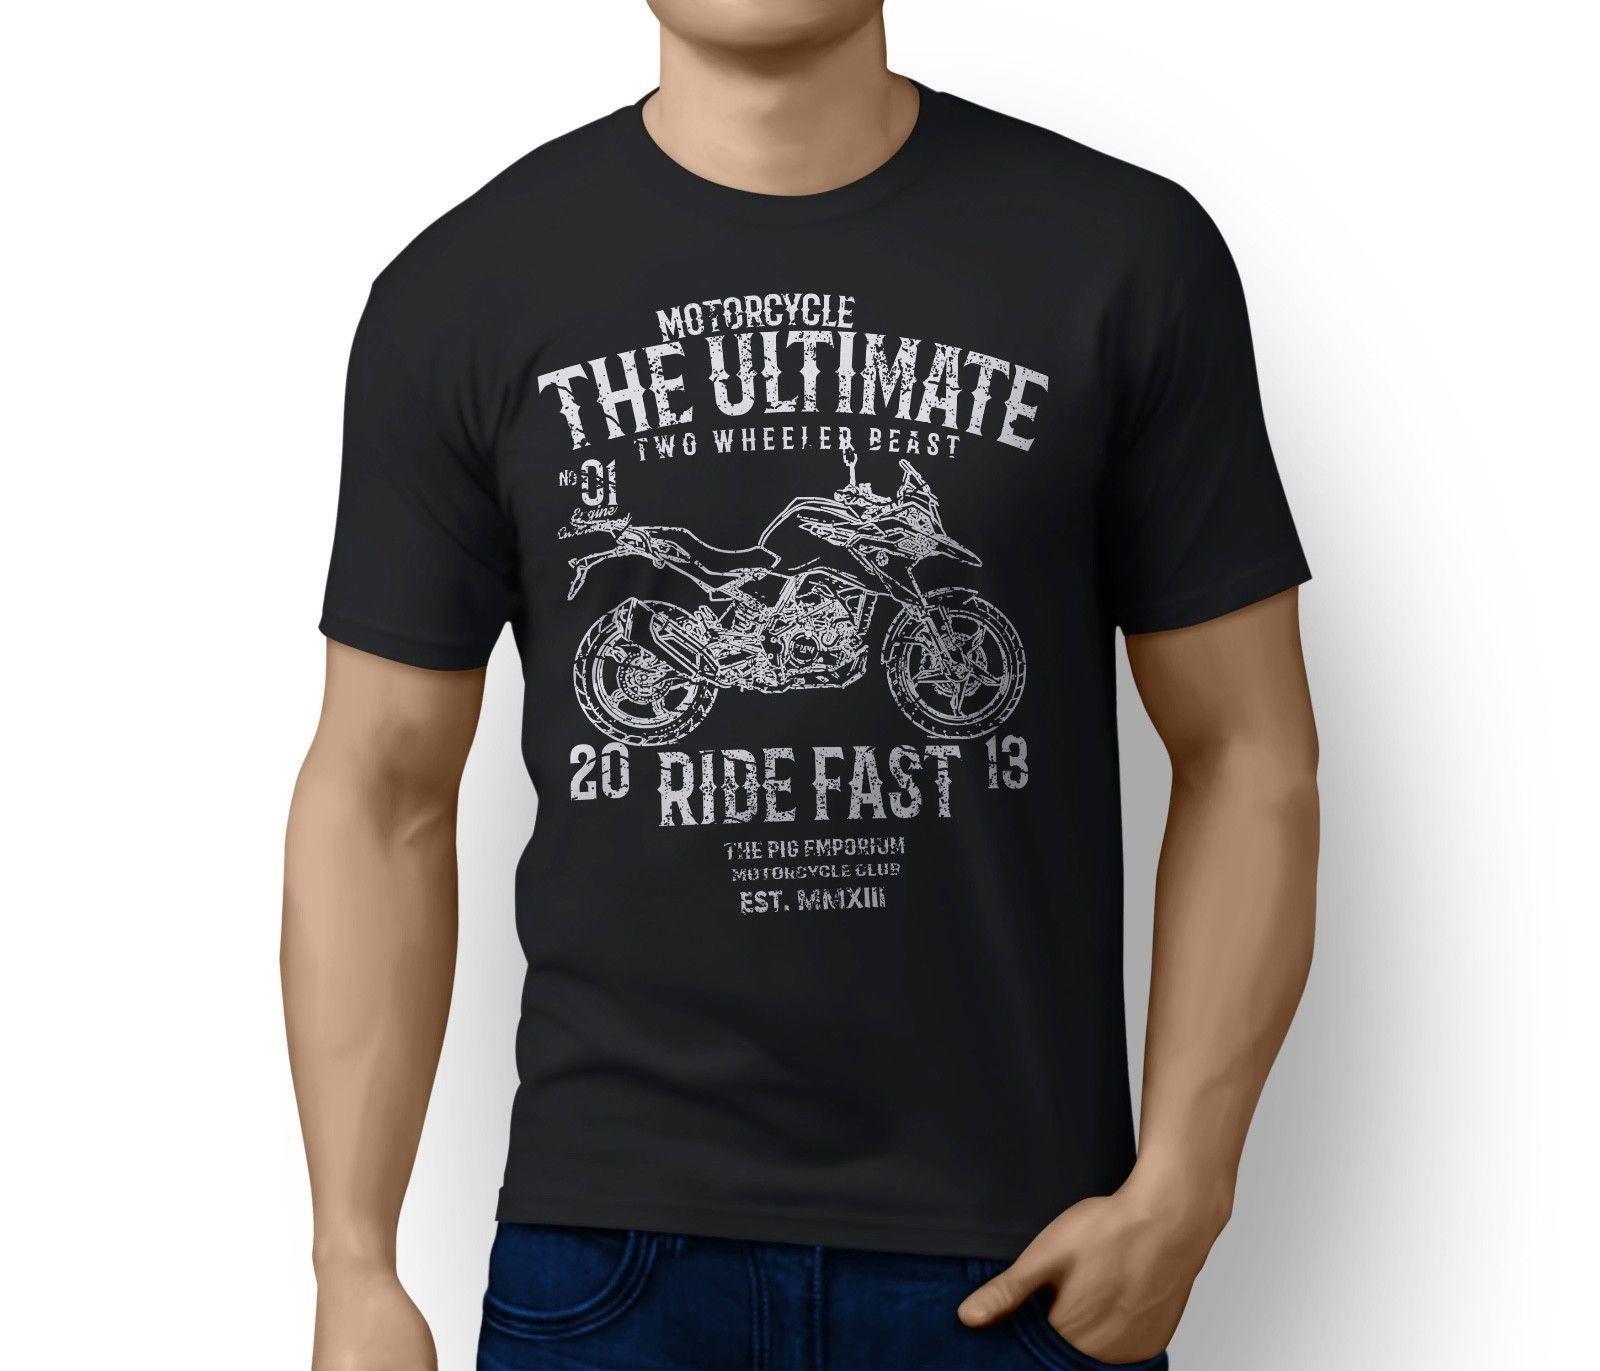 b356c5cb6 Details Zu RH Ultimate G310 GS Inspired Motorcycle Art T-shirt Funny ...